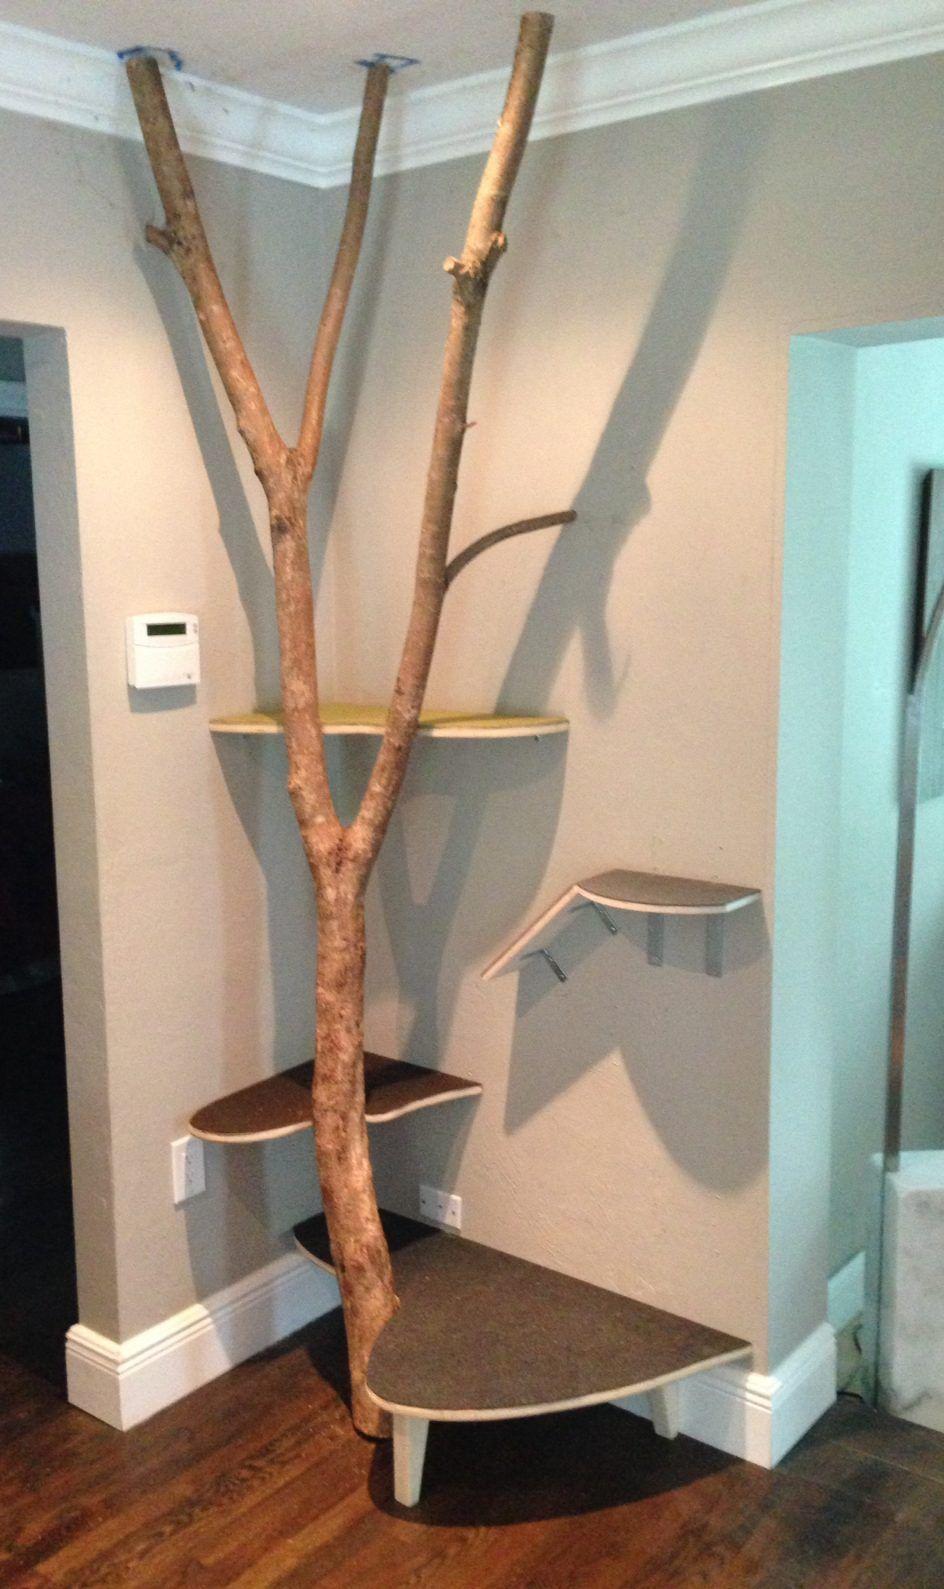 Shelving Ergonomic Shelf Ideas Cat Creative Shelf Cat Shelves Ideas Photo Catsdiyshelves Cat Tree House Diy Cat Tree Cat Tree